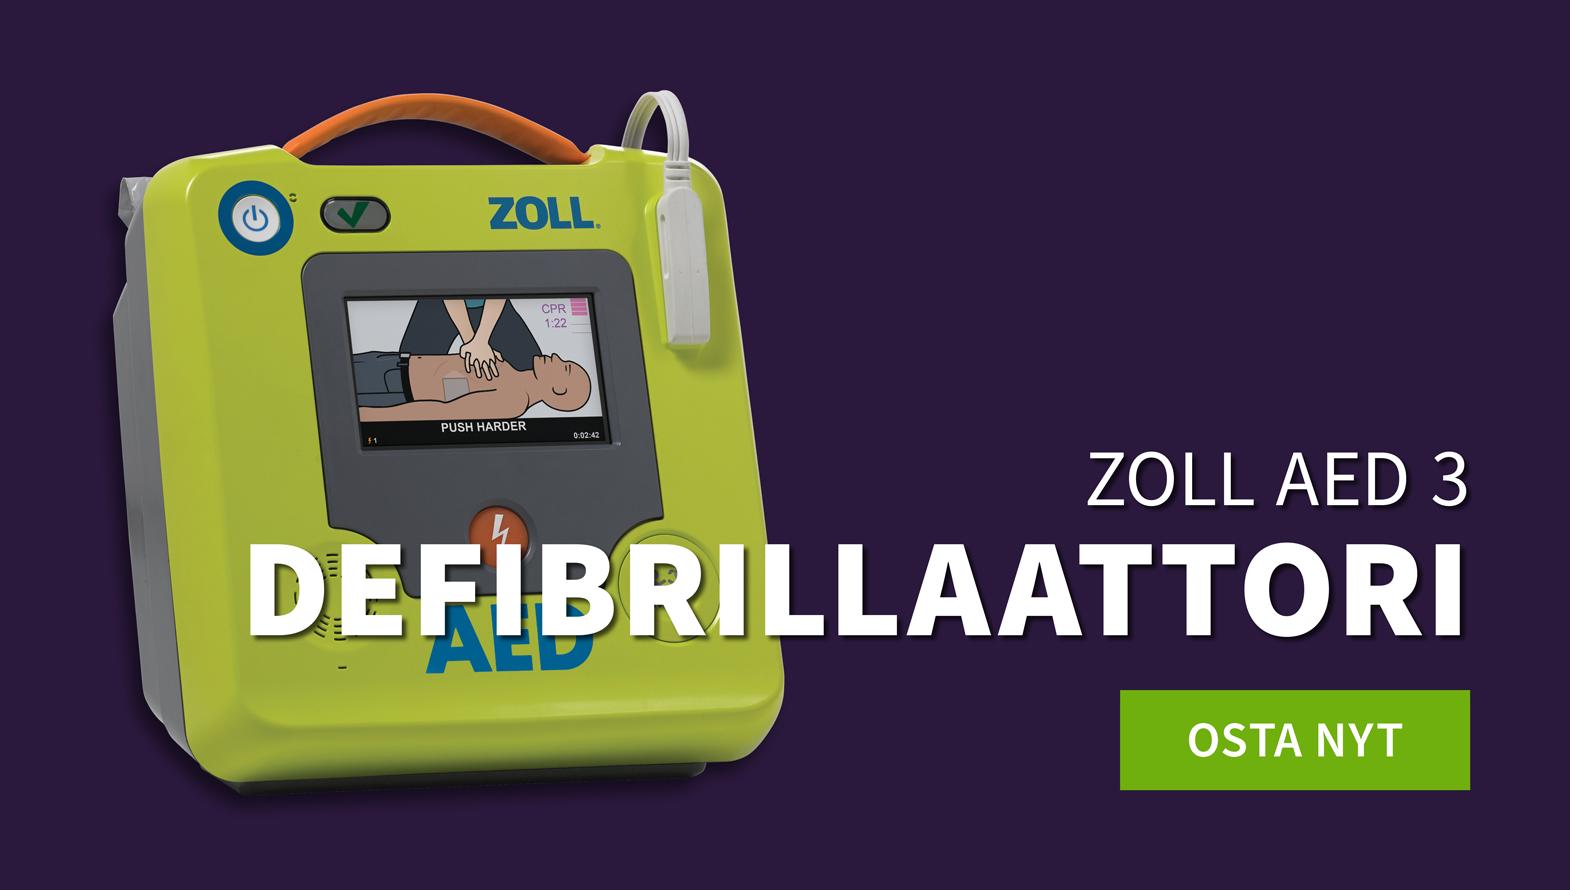 ZOLL AED 3 defibrillaattori